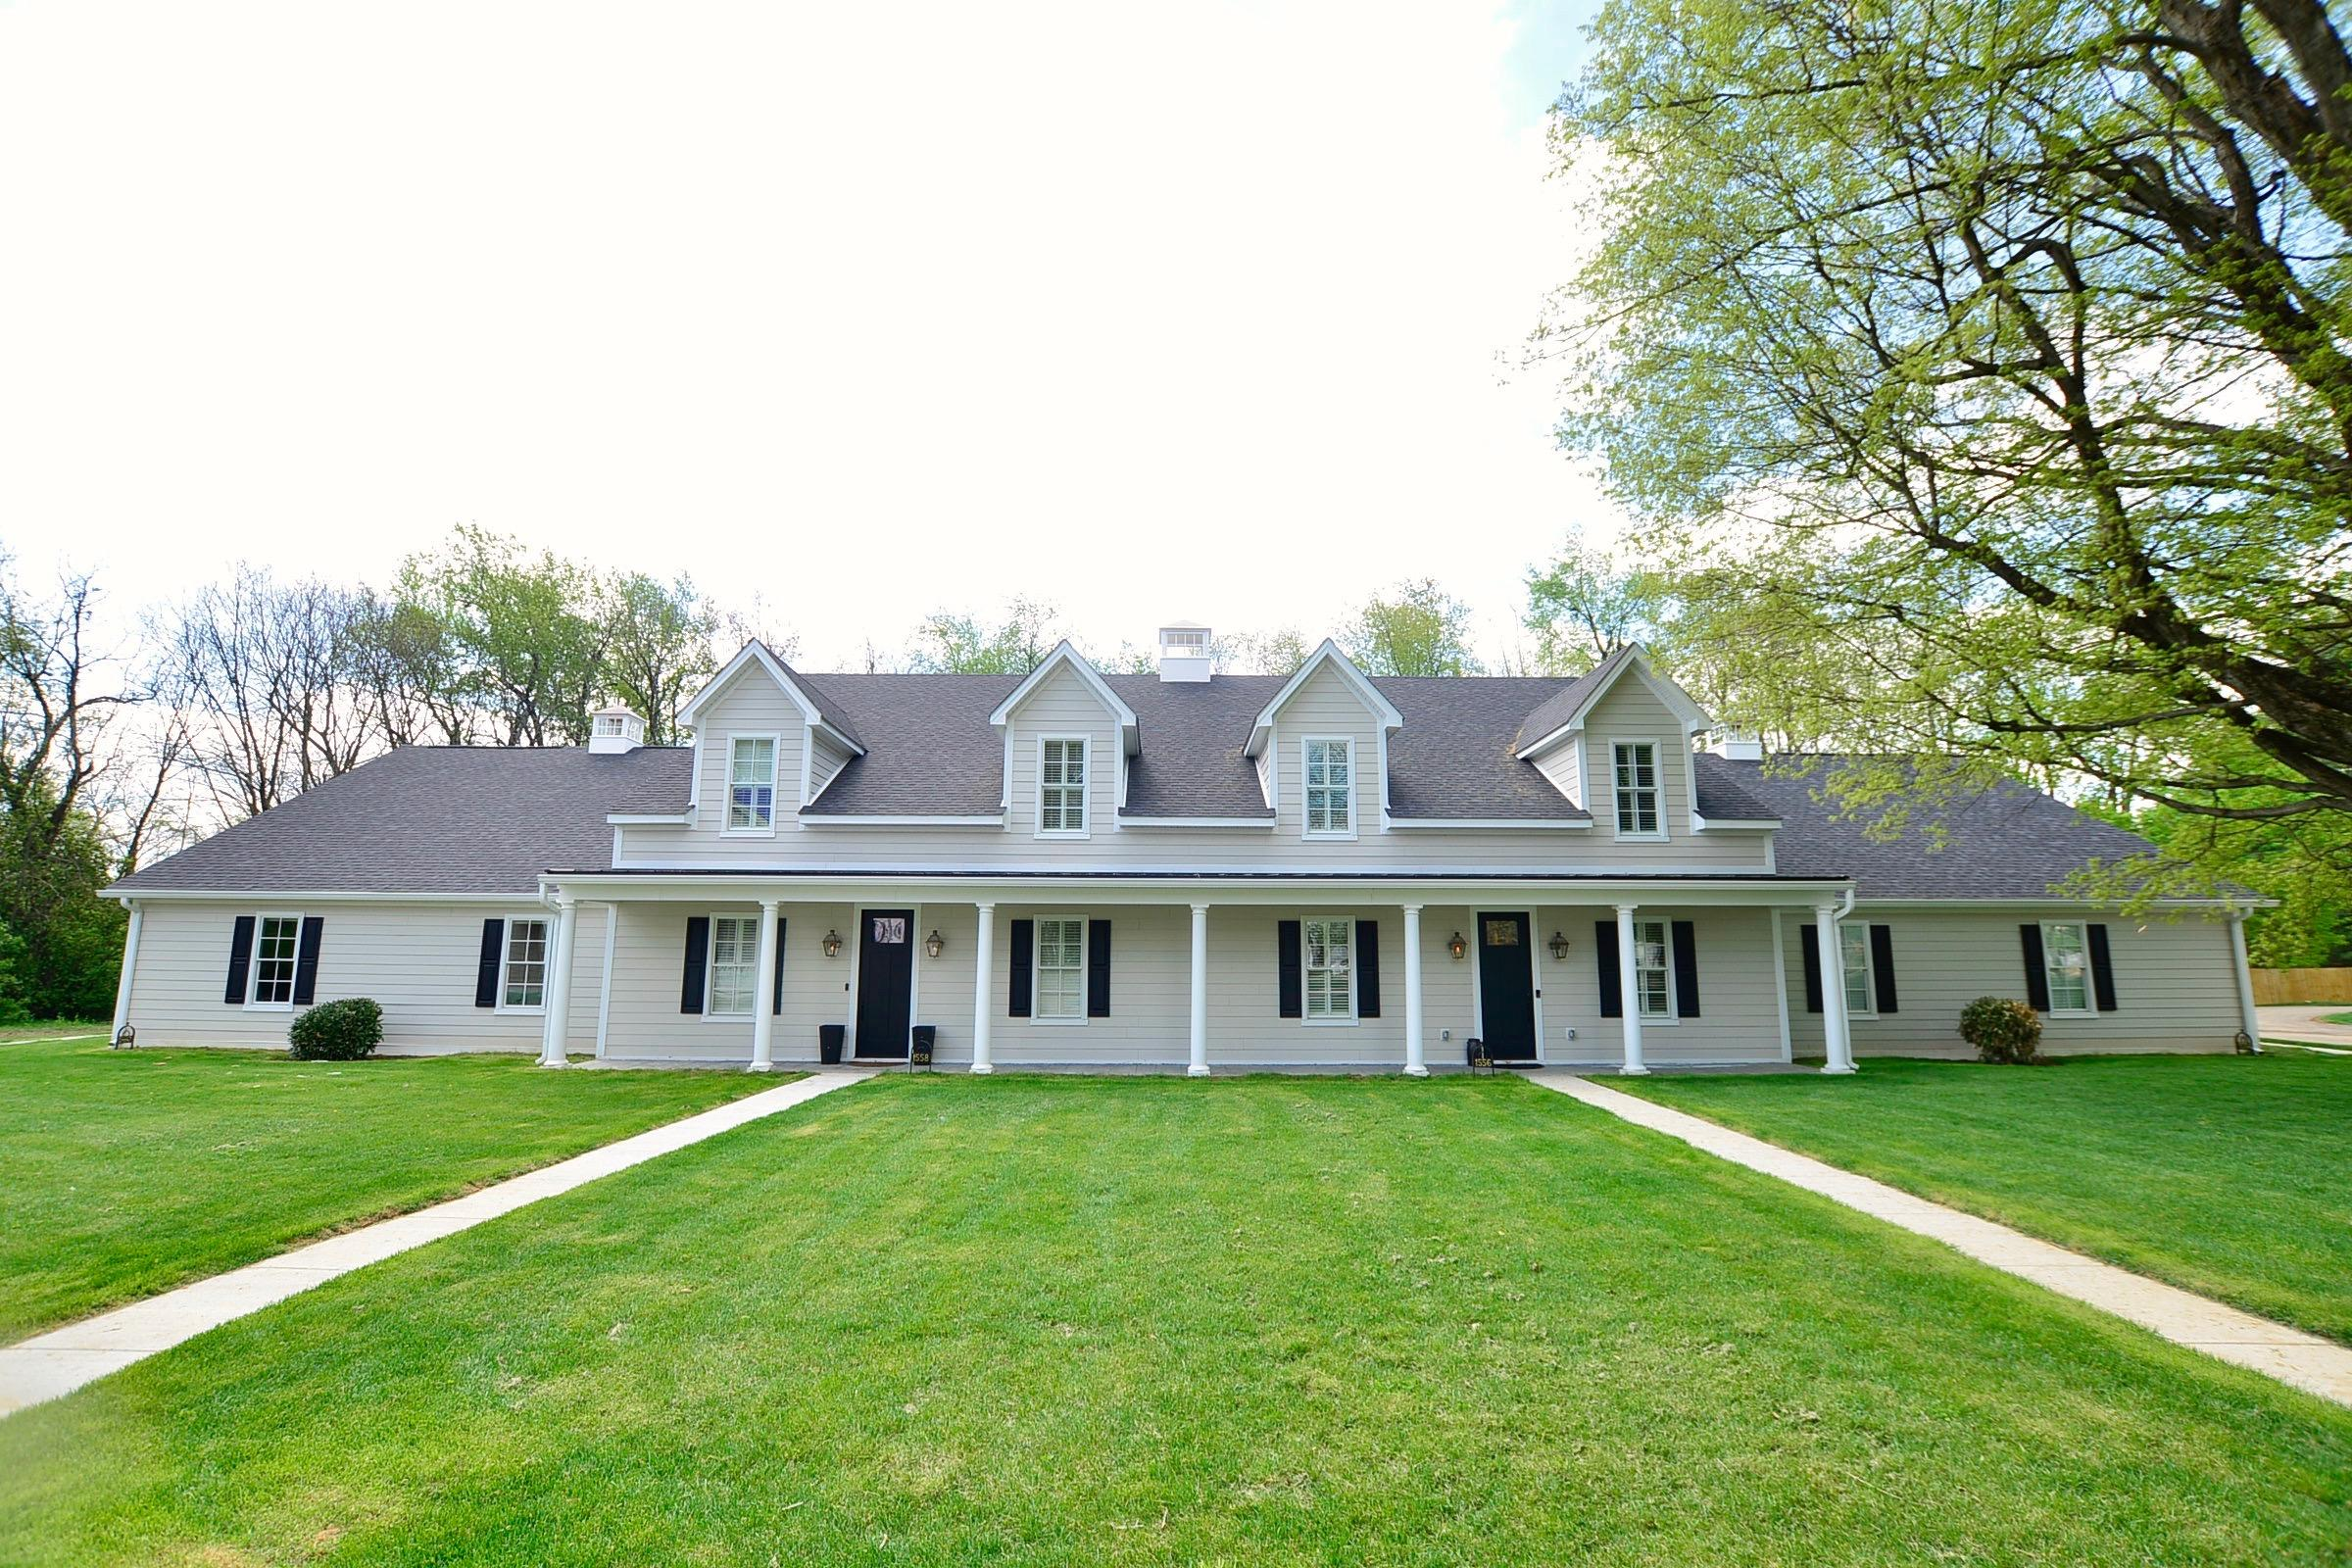 1532 Winners Circle 15, Lexington, KY 40513